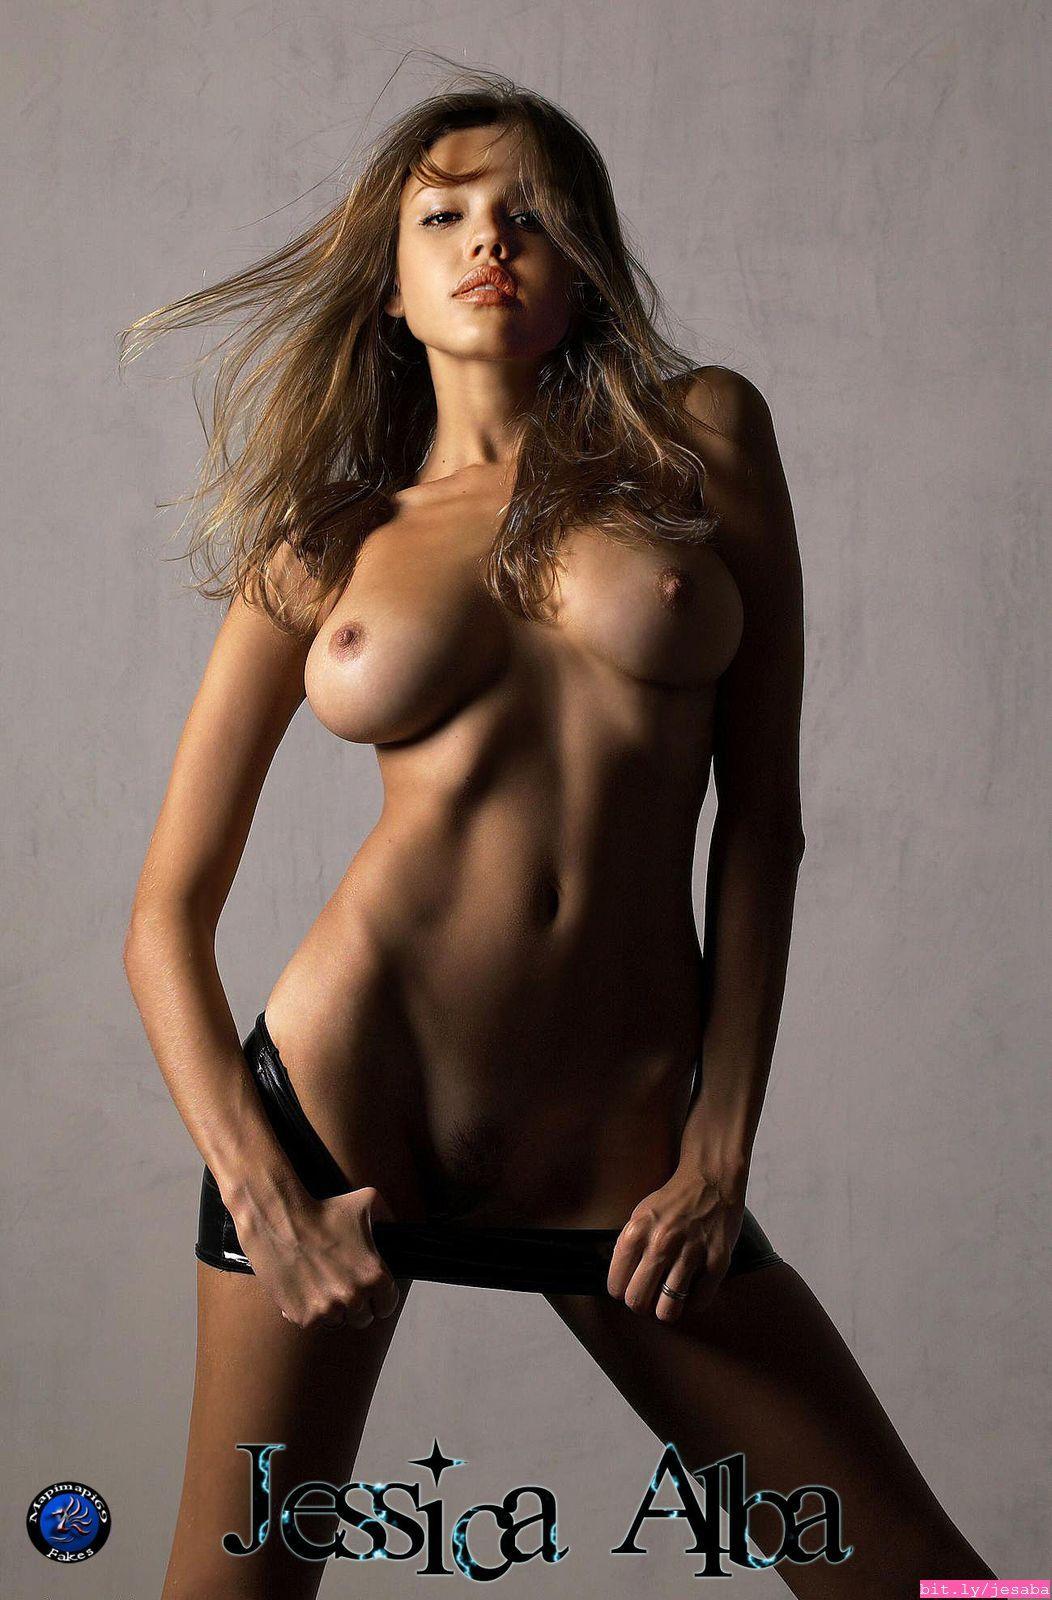 The angelina jolie jessica alba nude consider, that